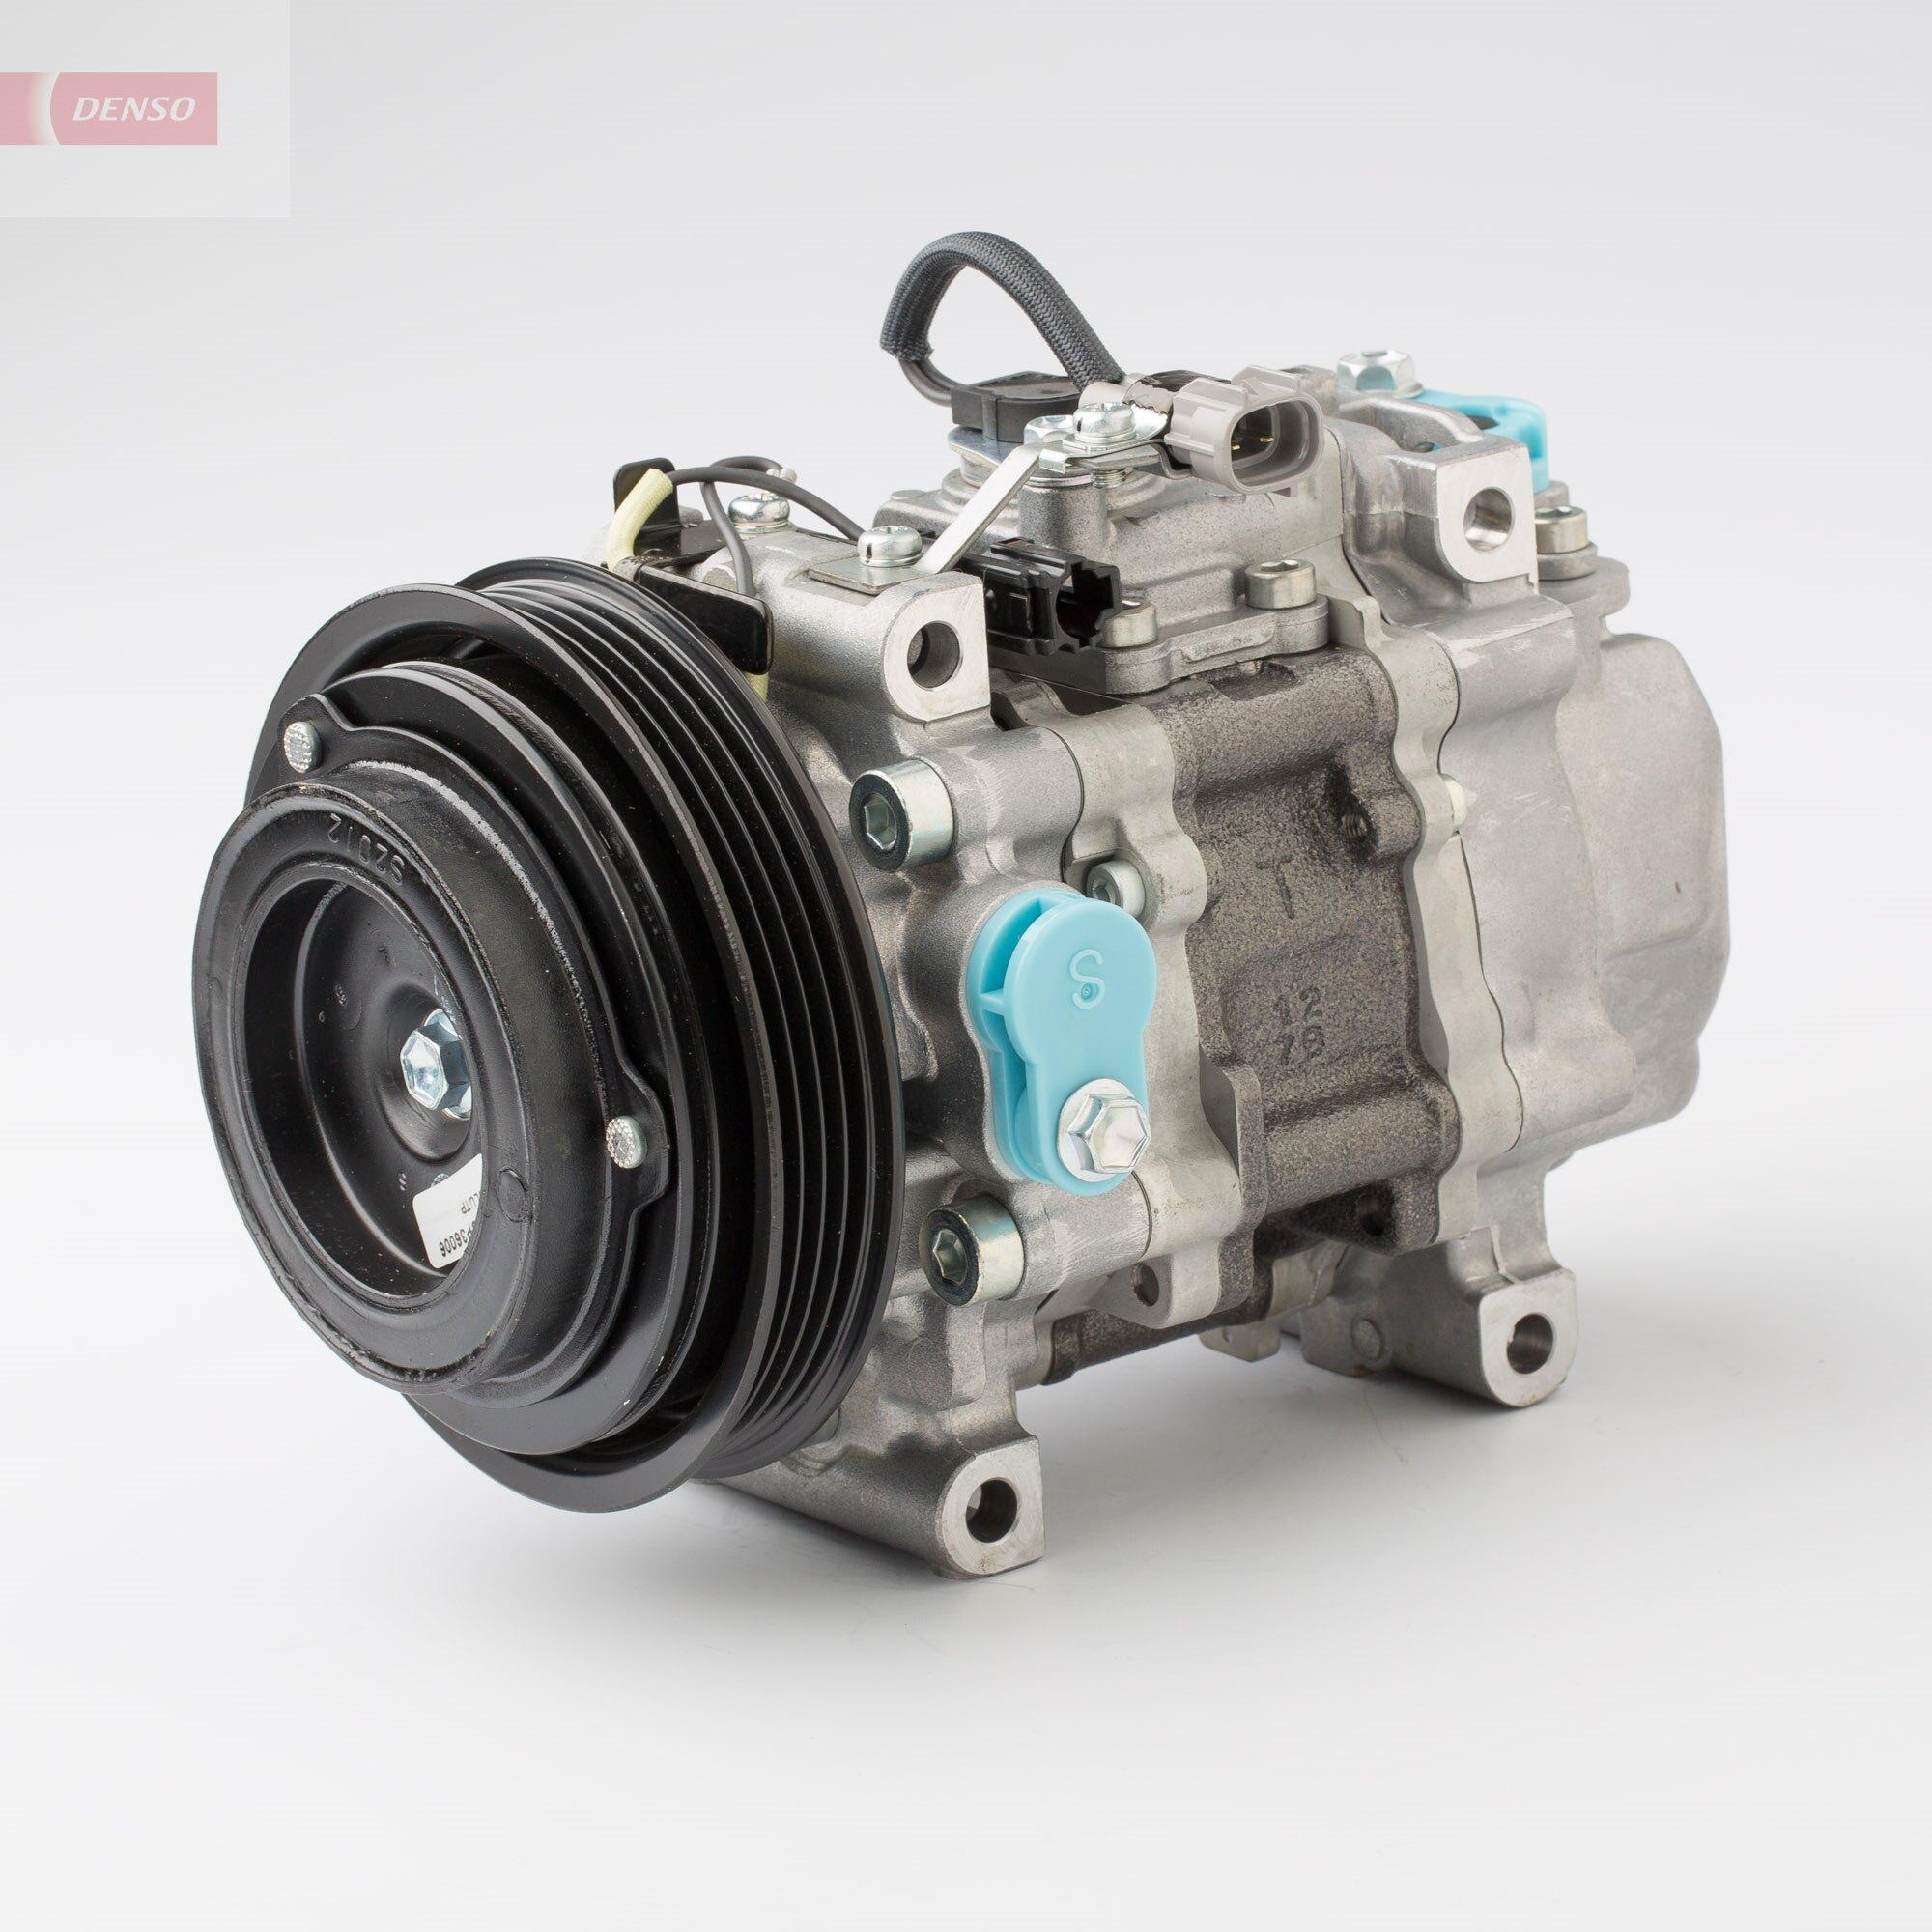 Kompresor klimatizace DENSO DCP36006